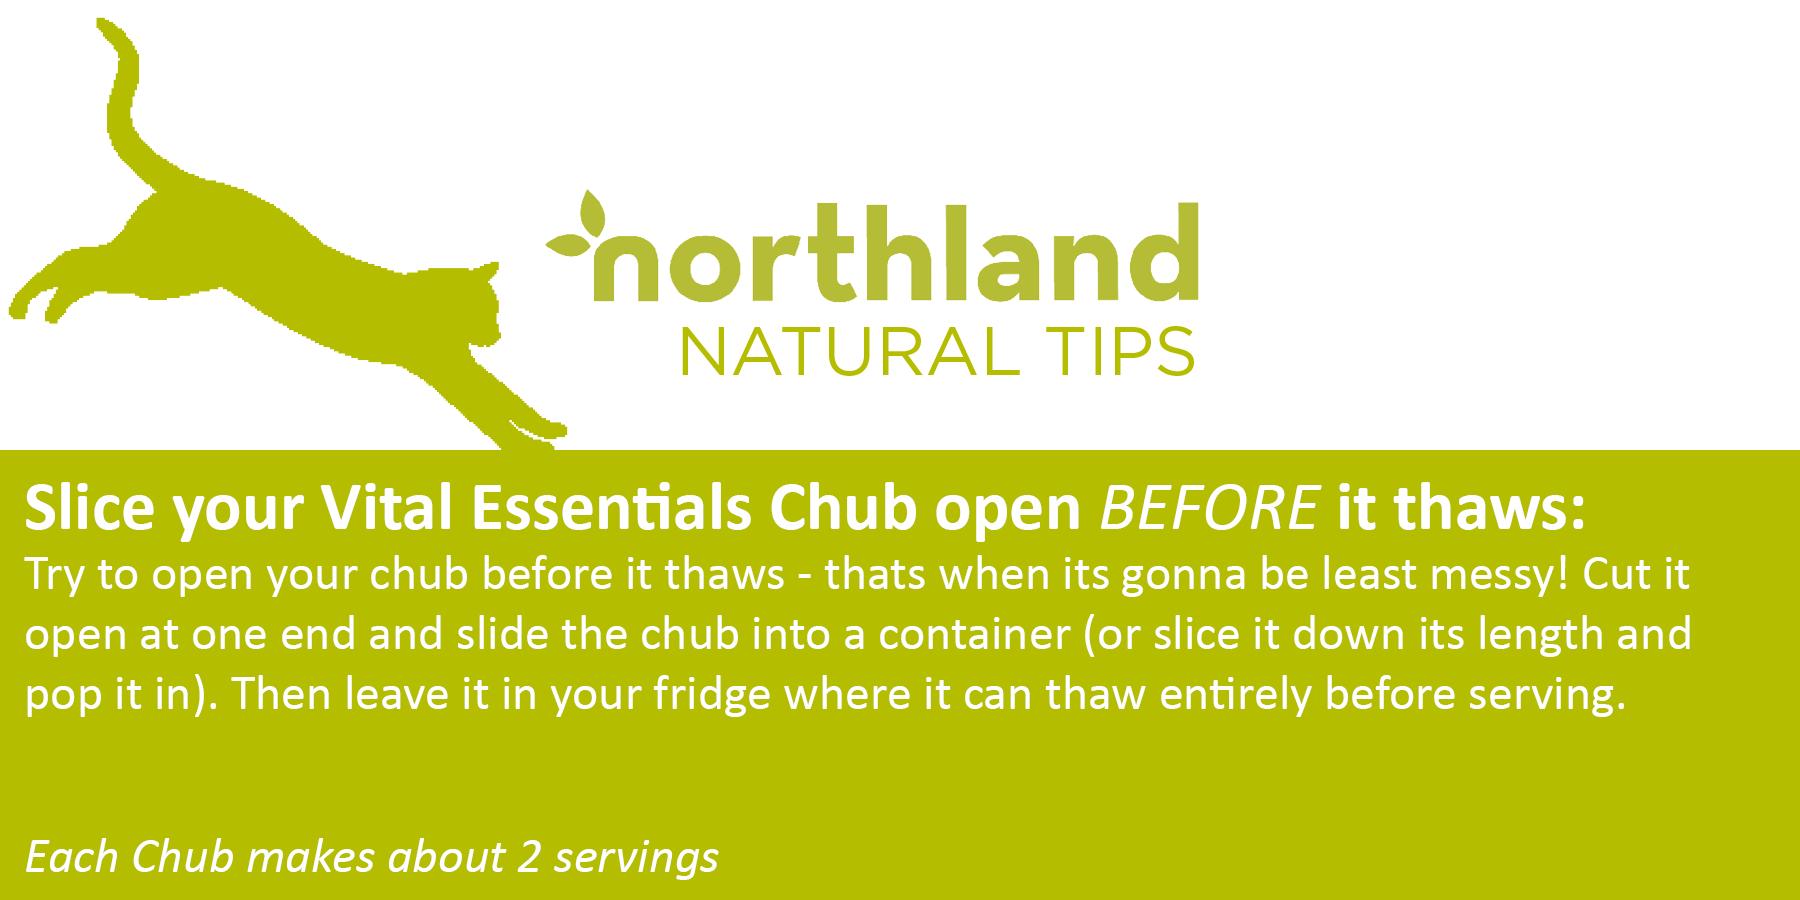 Raw Chub Tip